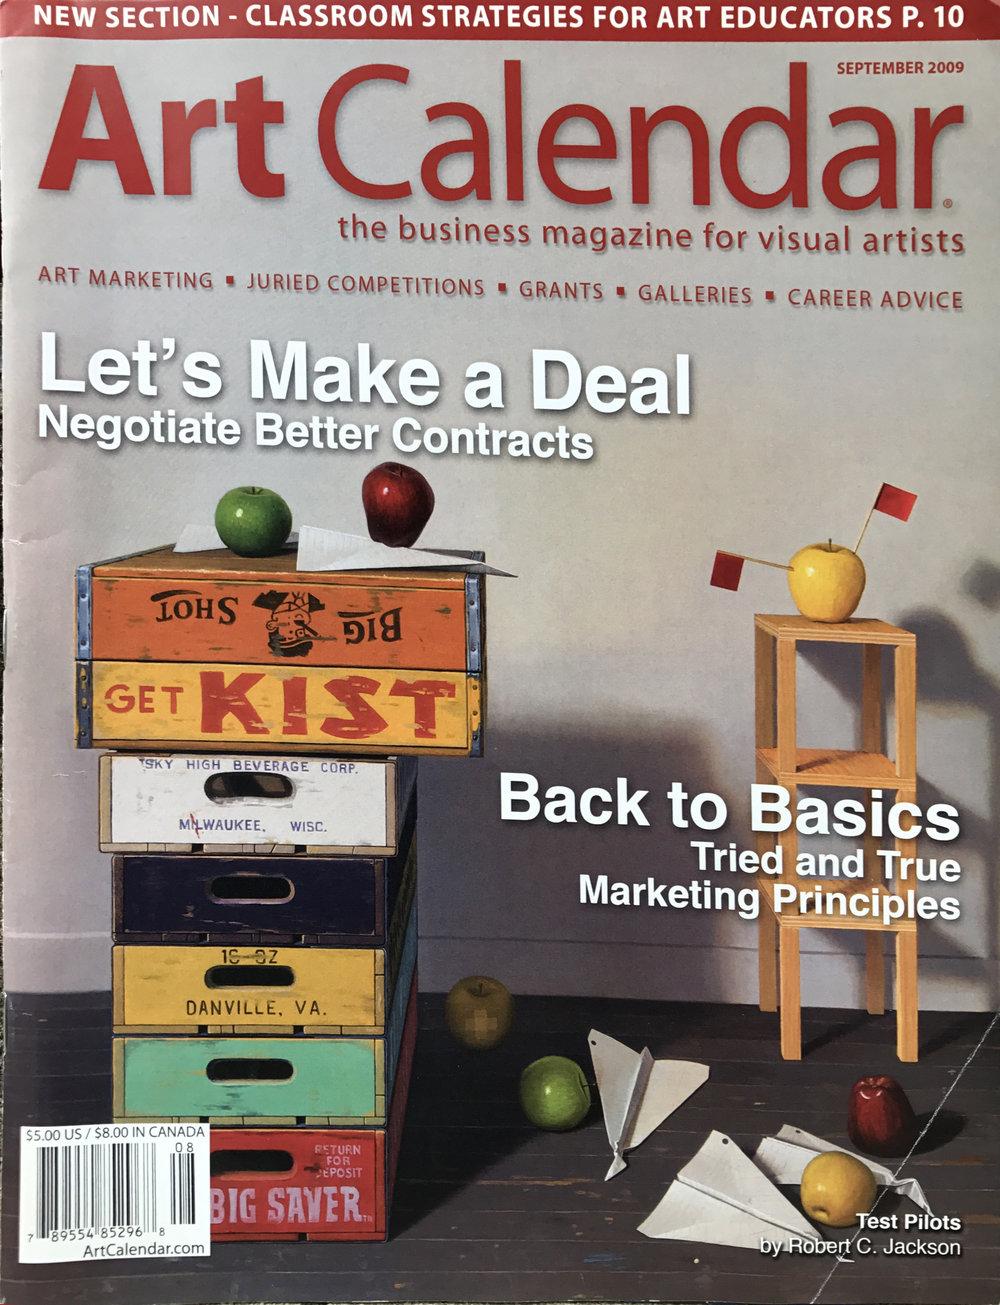 Art Calendar The Business Magazine for Visual Artists